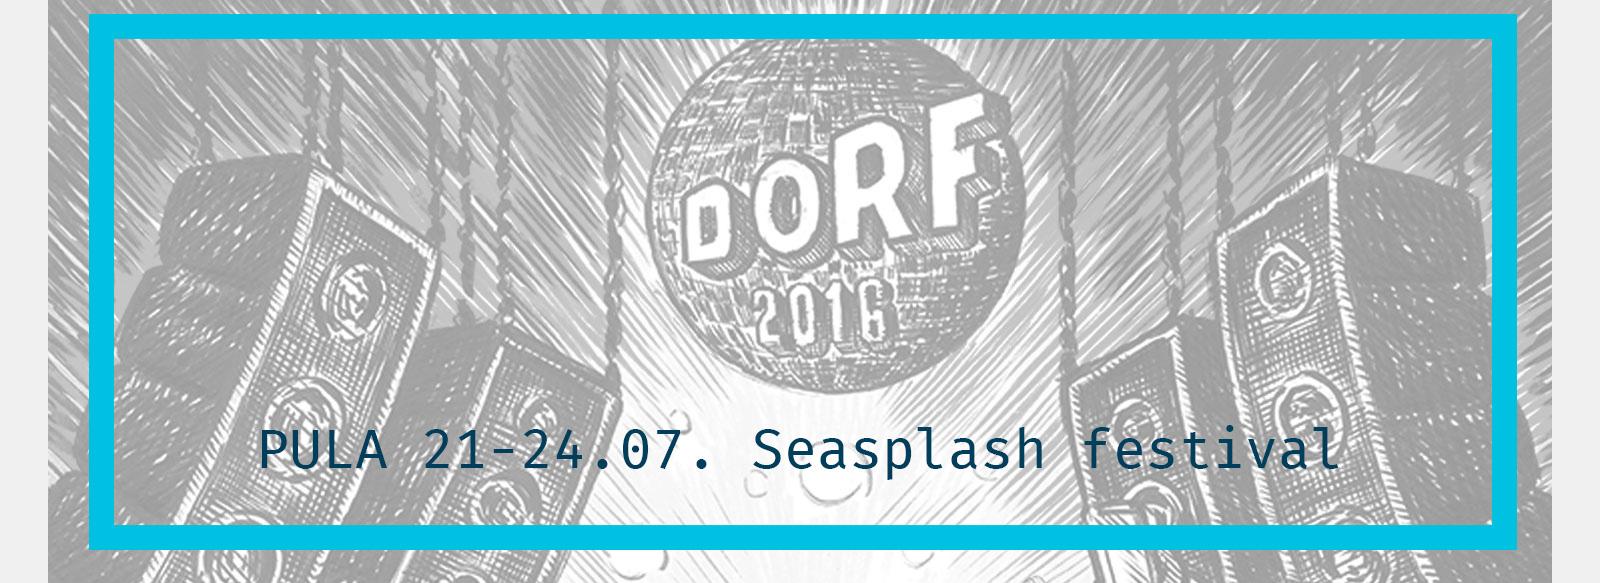 dorf-seasplash